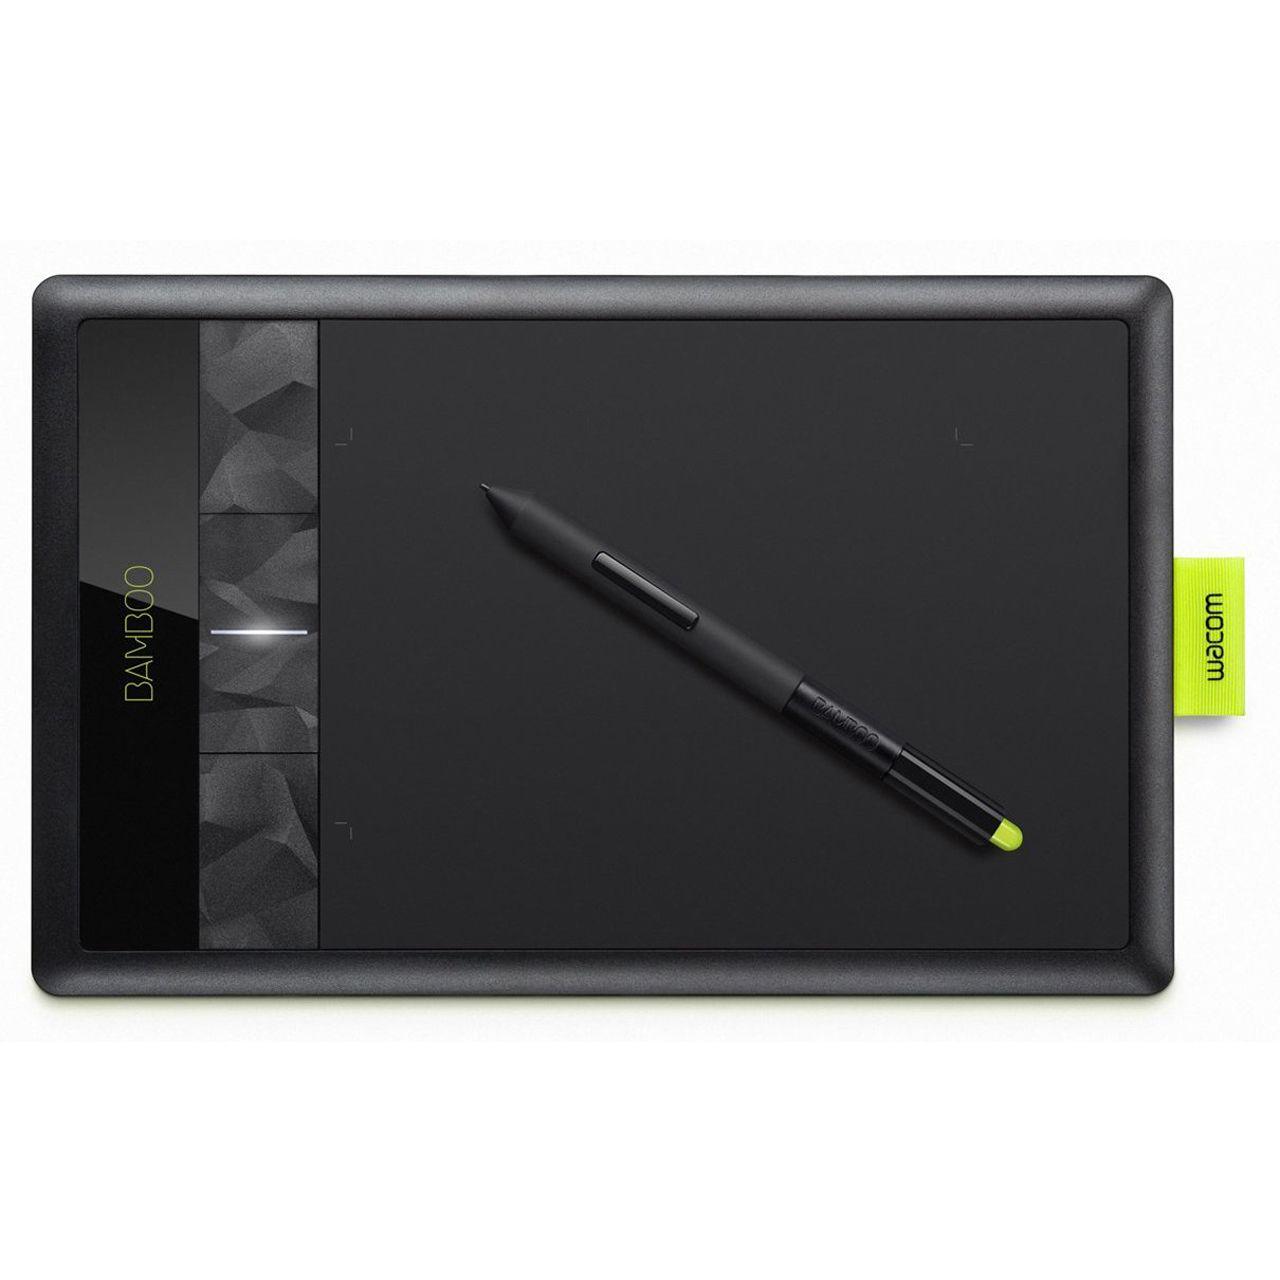 wacom bamboo pen touch 3 gen 147x92 mm usb schwarz grafiktabletts. Black Bedroom Furniture Sets. Home Design Ideas